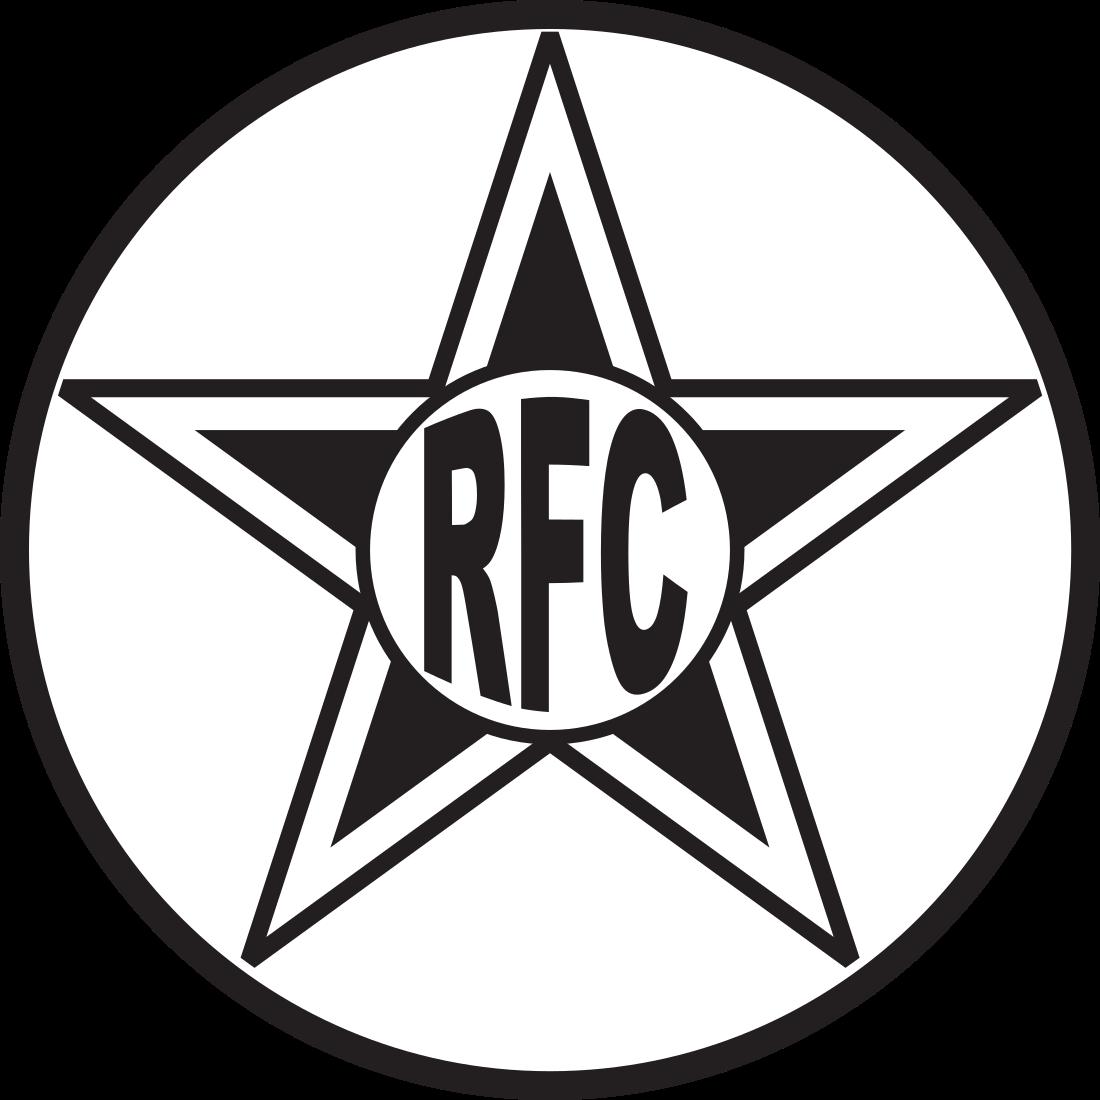 resende fc logo escudo 3 - Resende Logo - Resende Futebol Clube Escudo